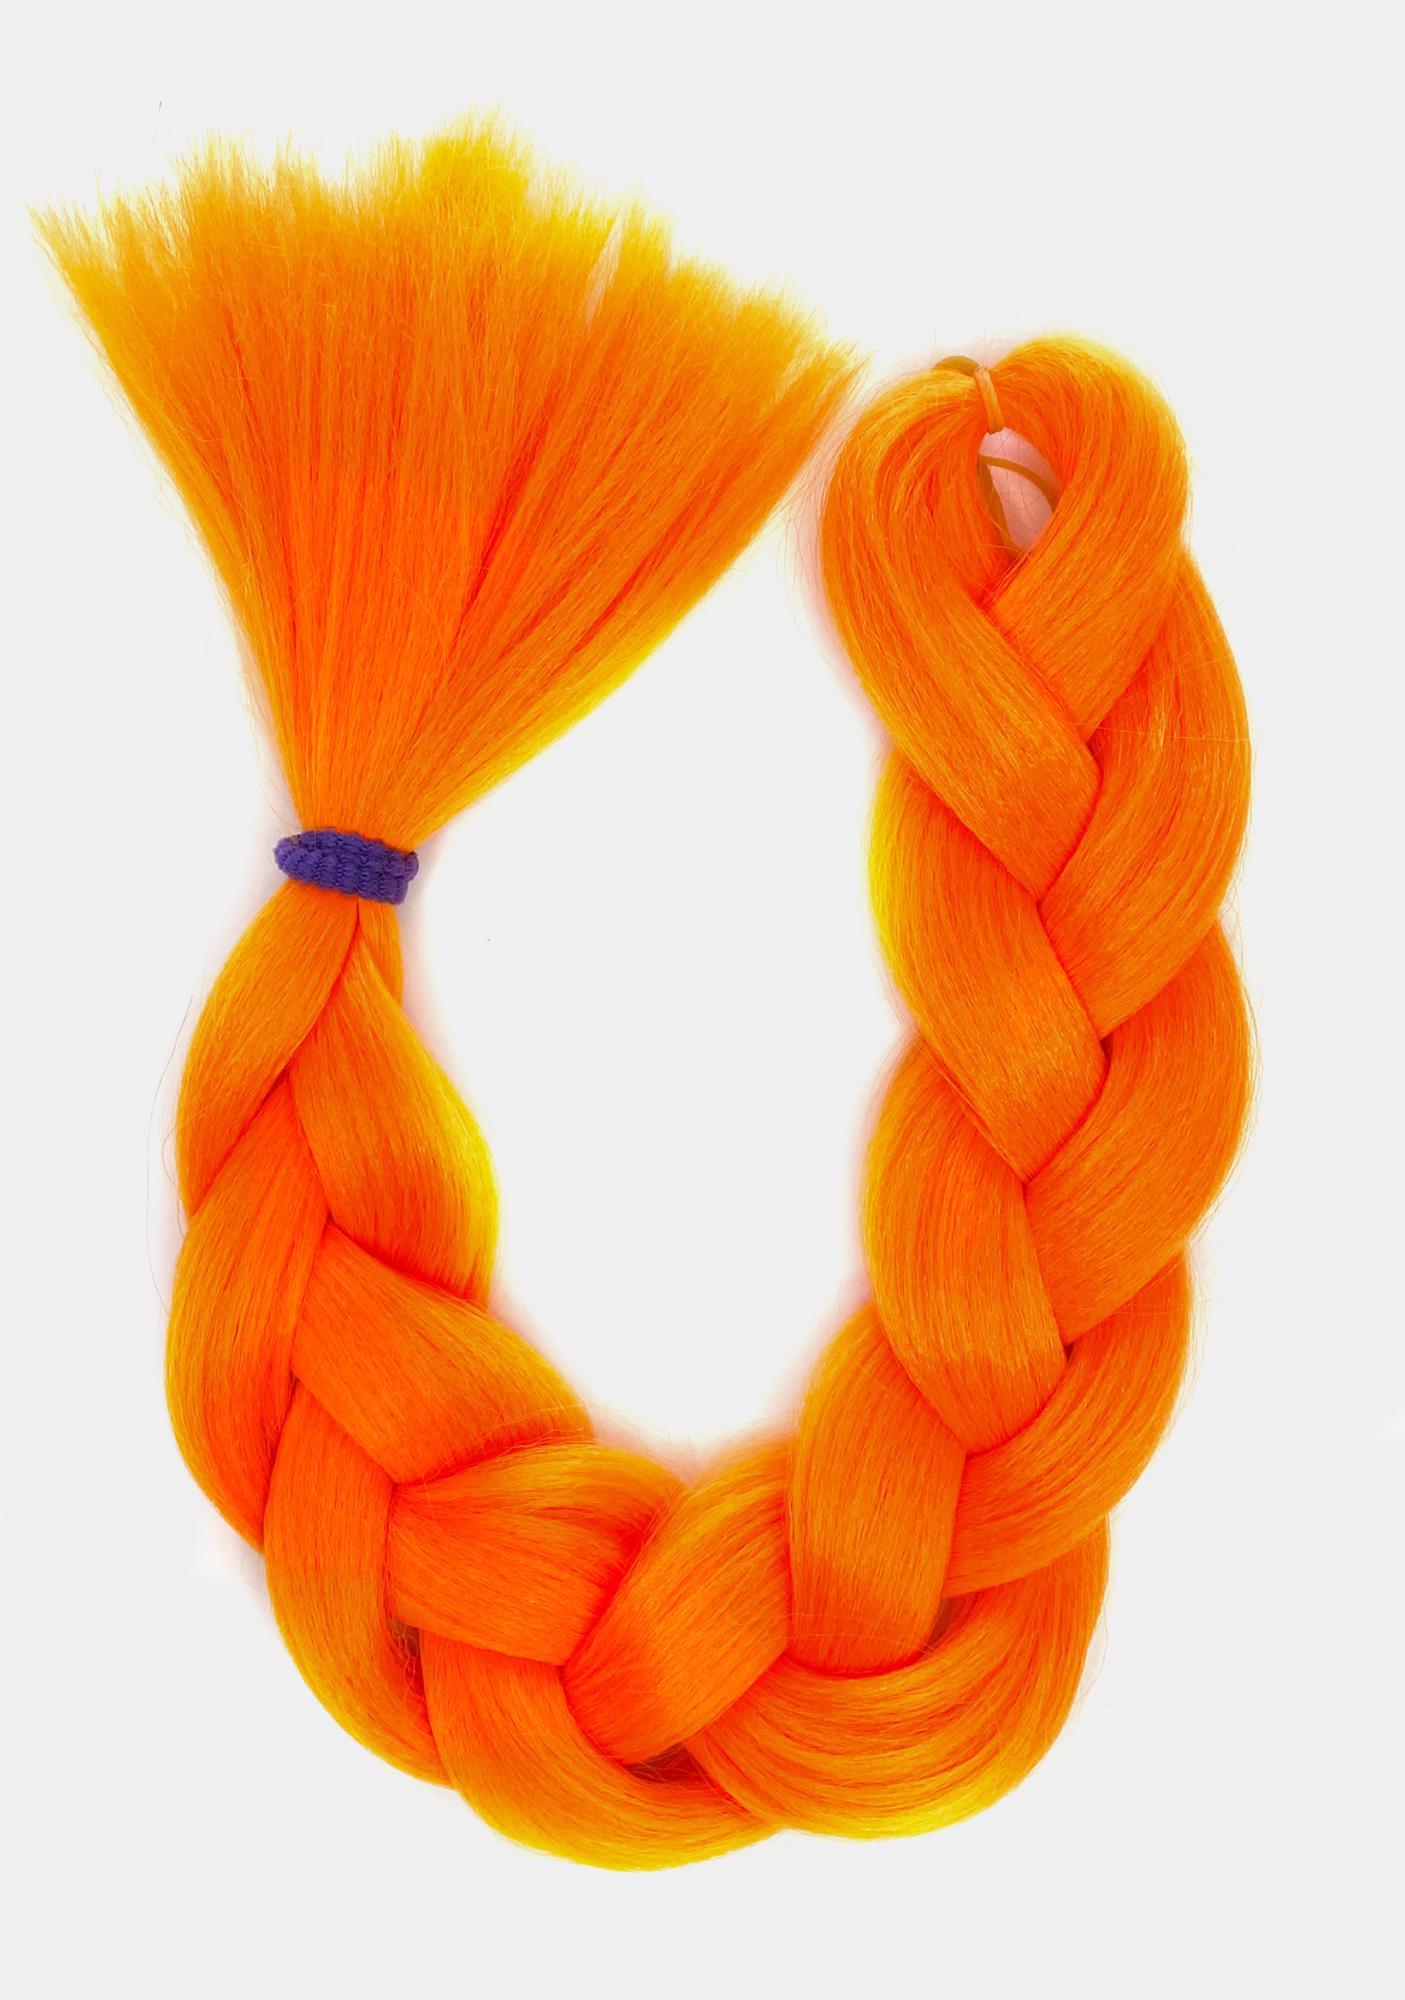 Lunautics Bang Hair Extensions